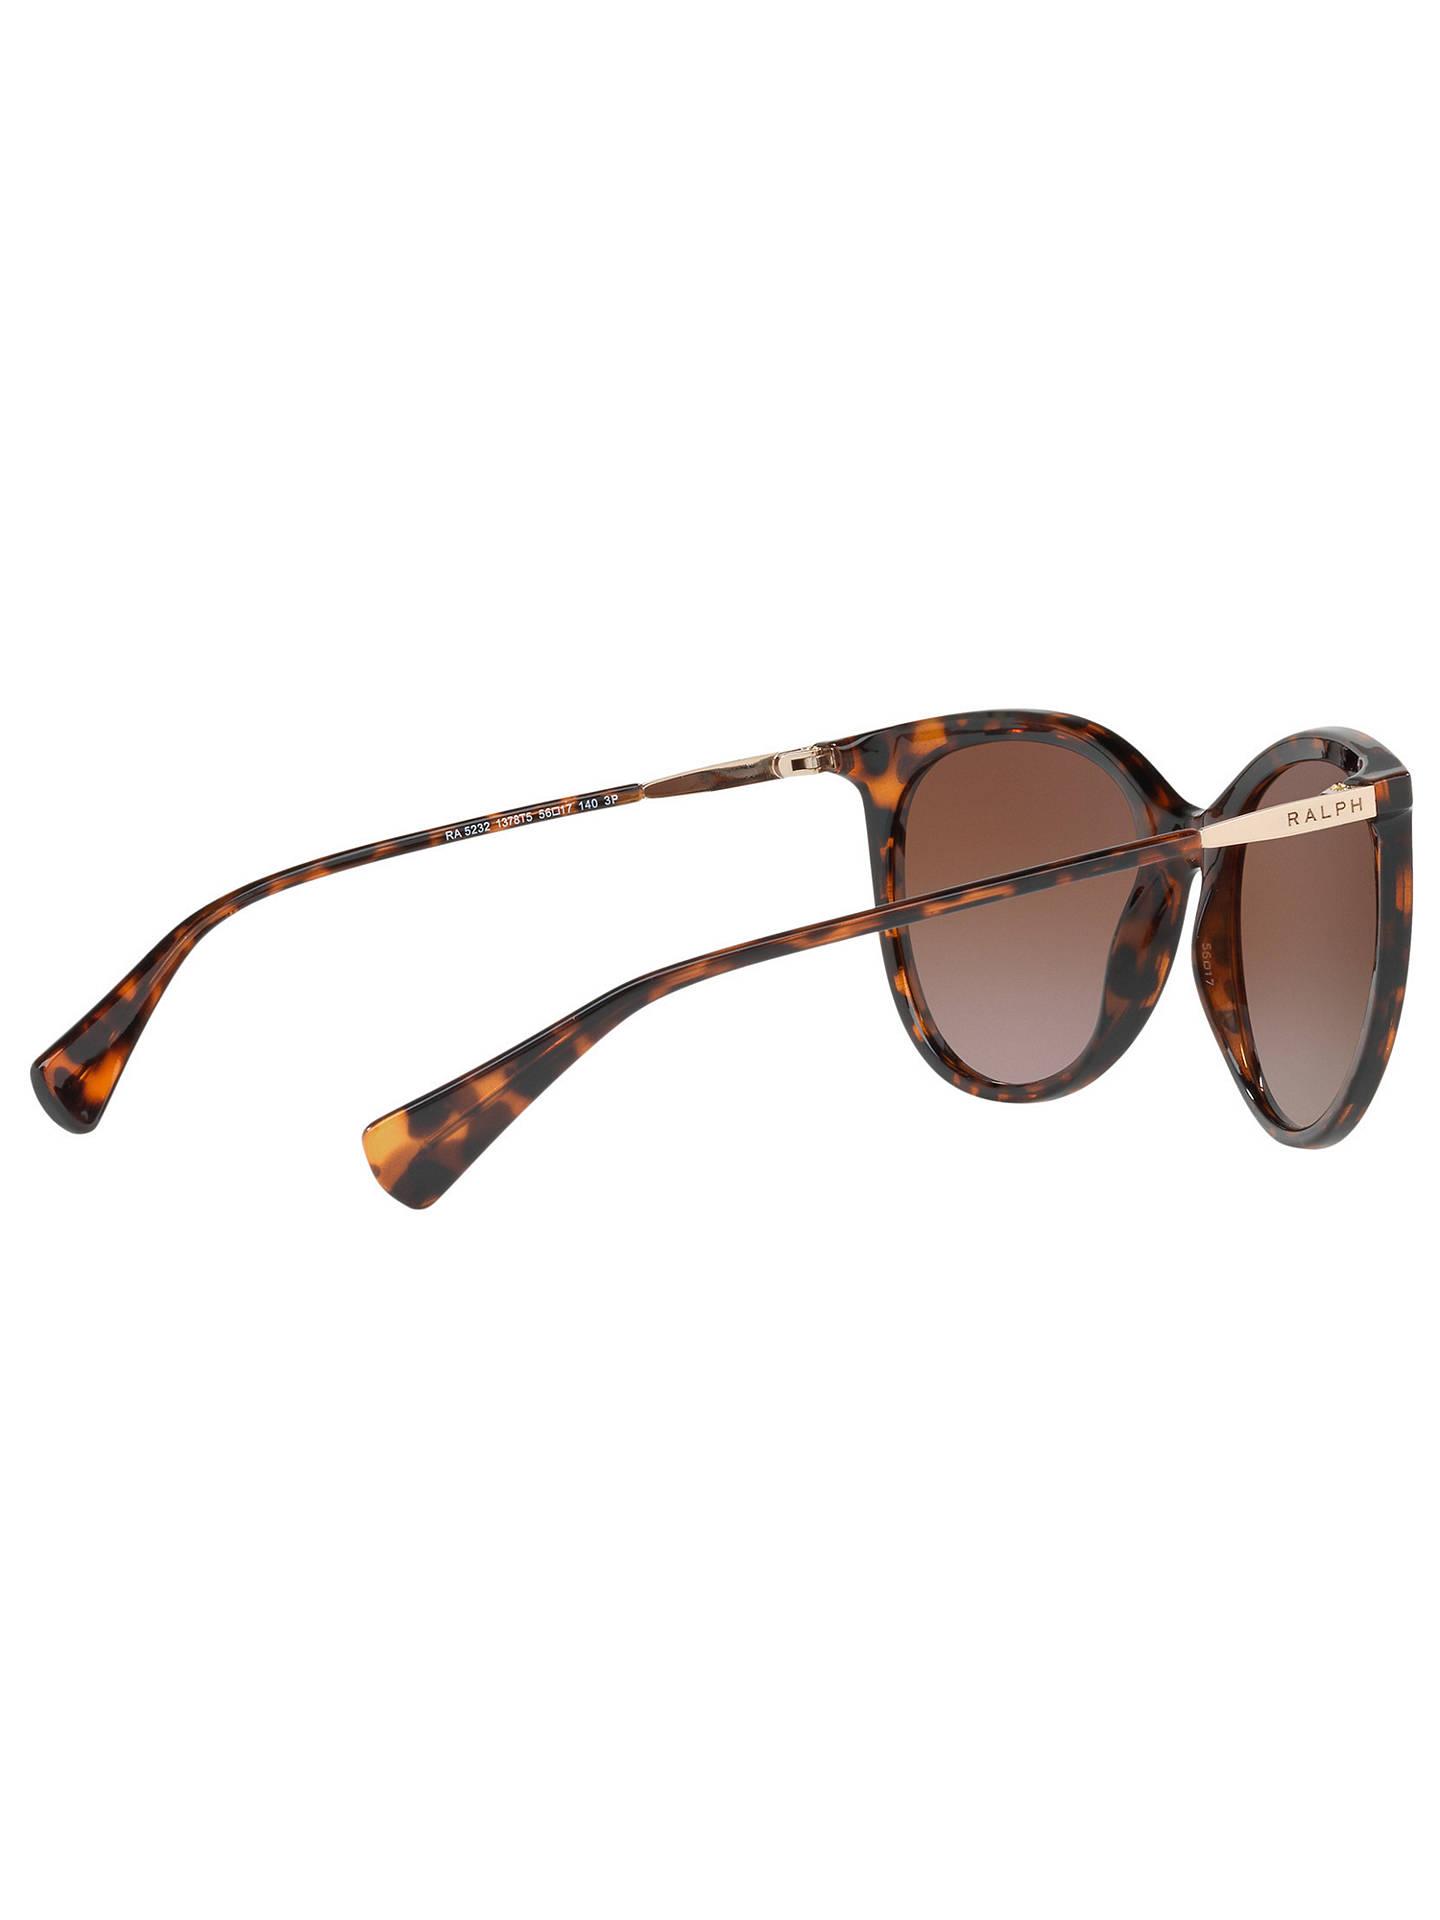 9164a4badd Ralph RA5232 Polarised Cat s Eye Sunglasses at John Lewis   Partners